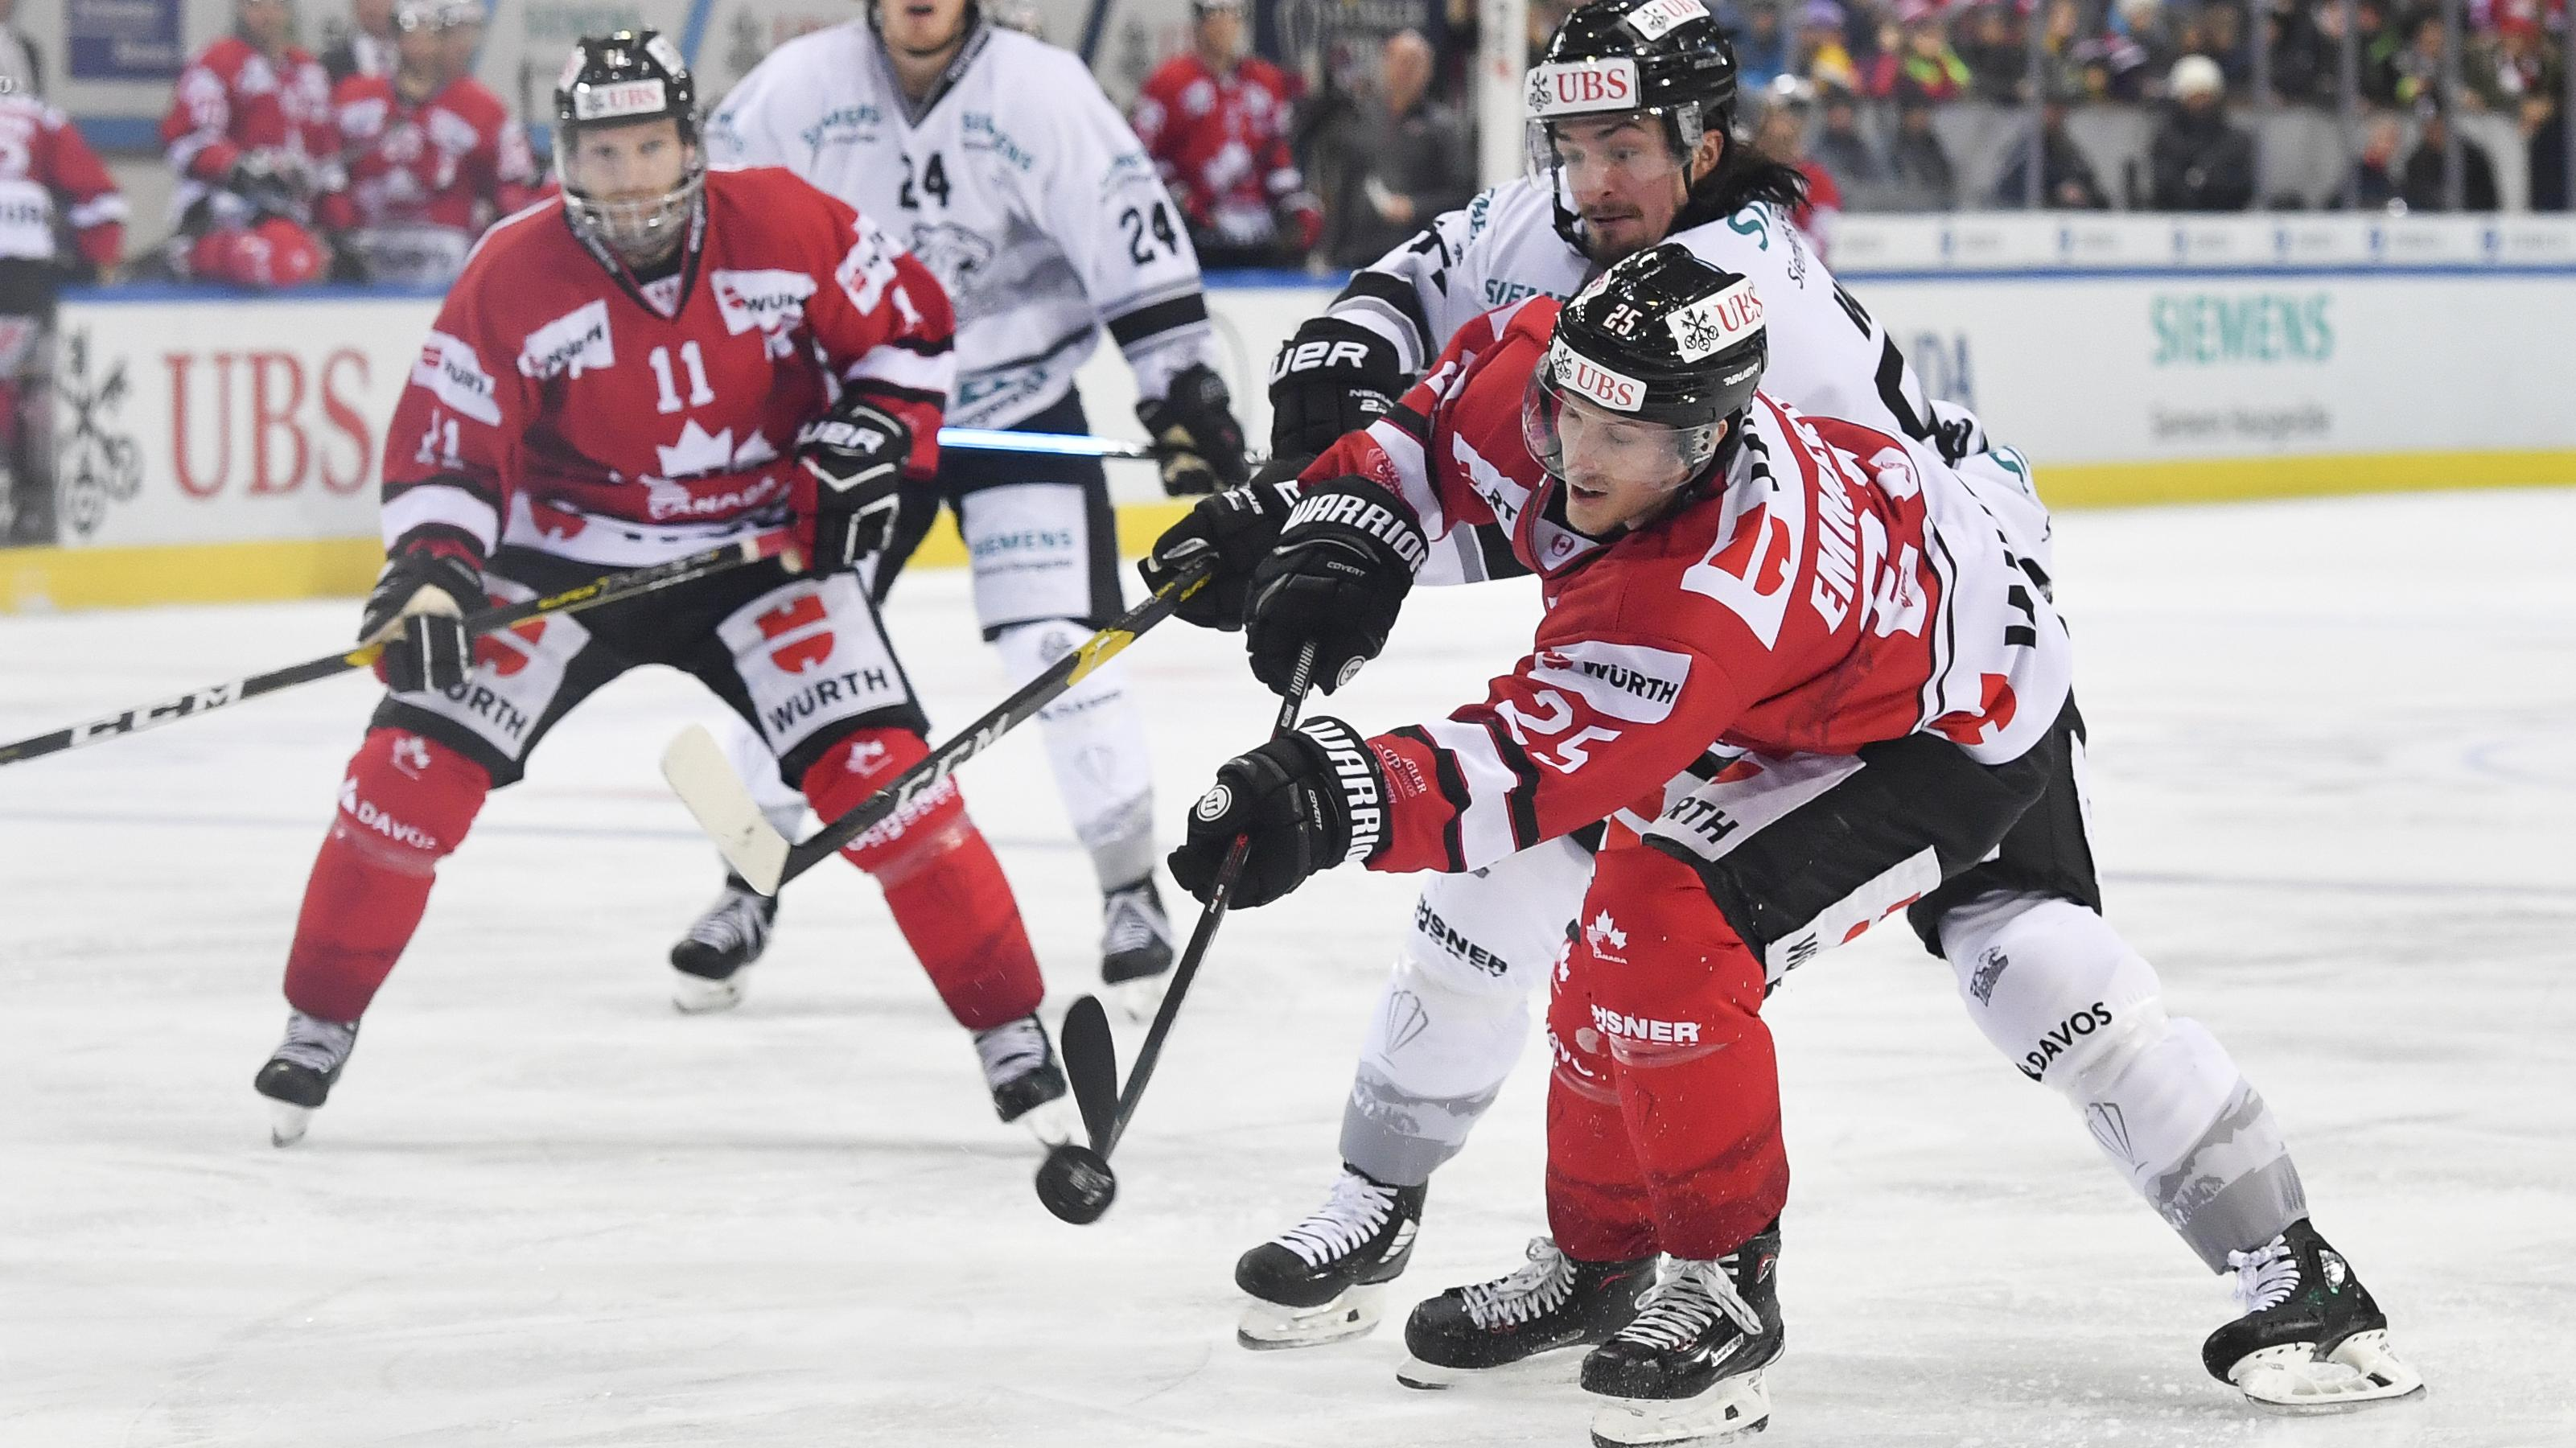 Szene aus dem Spiel Kanada gegen Nürnberg